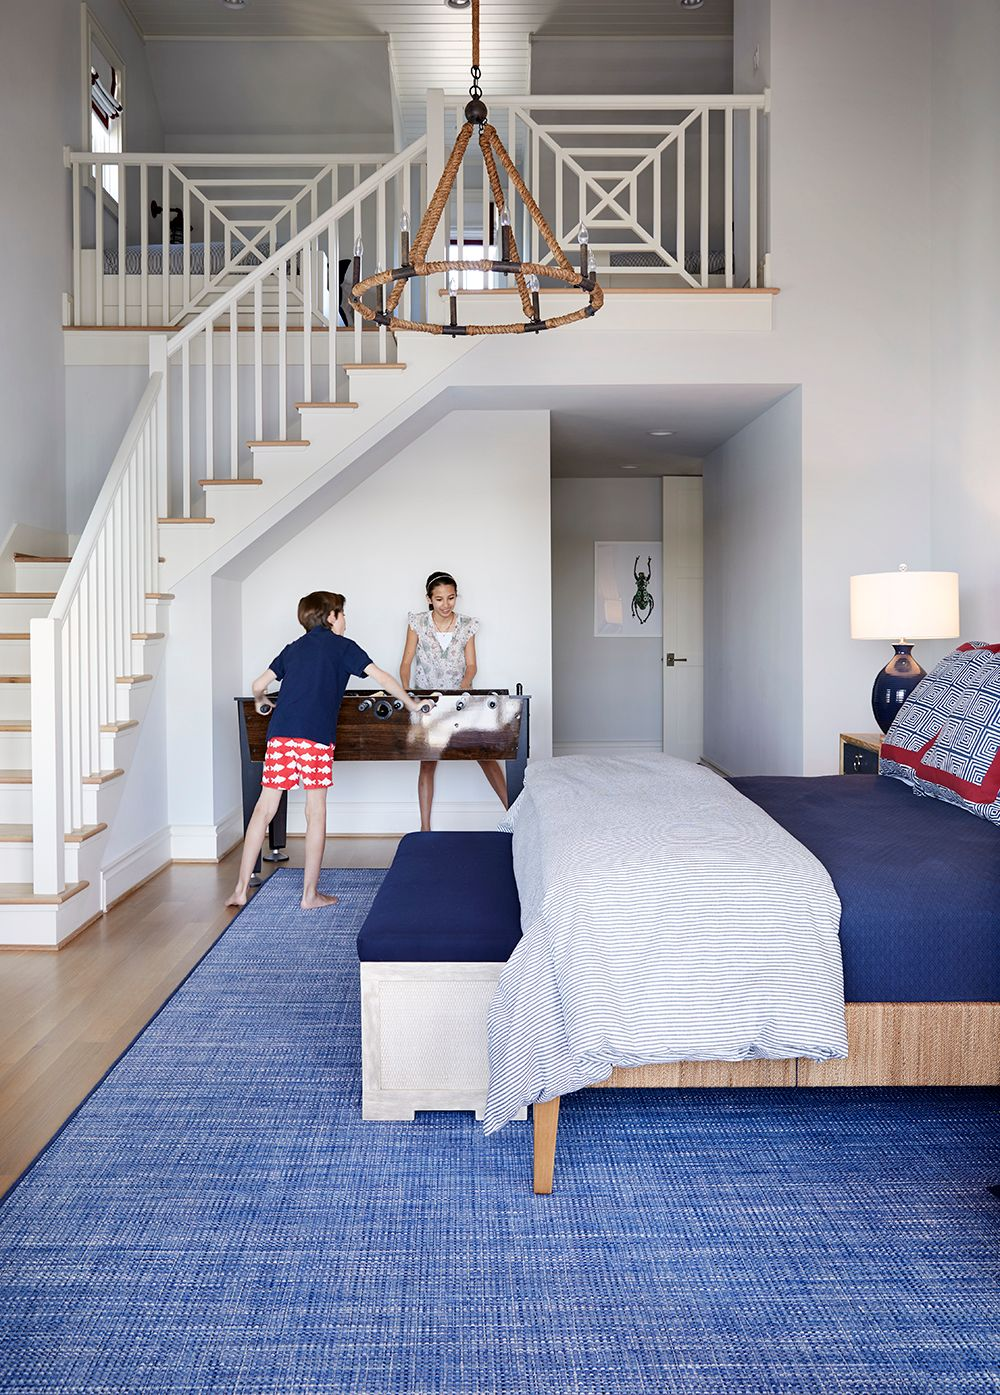 Long_Cove_Boys_Room-2.jpg